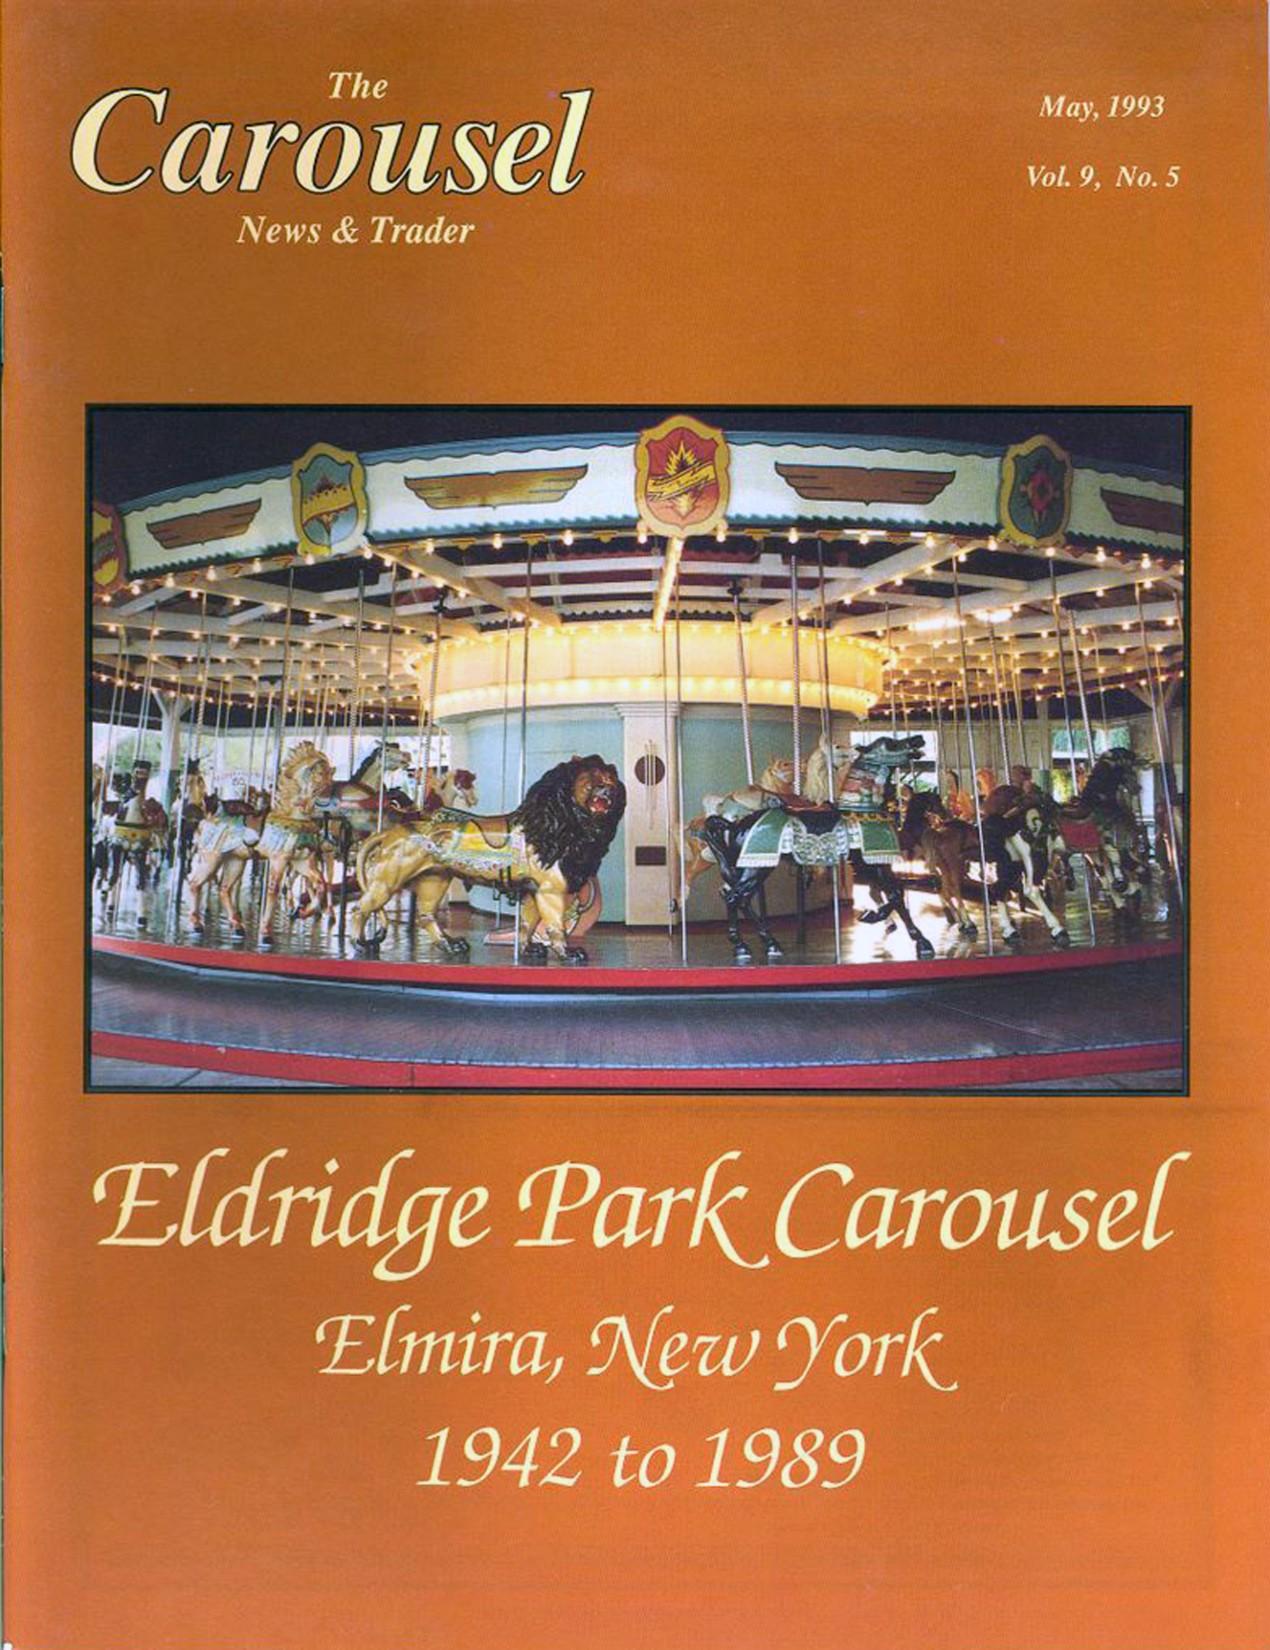 cnt_05_1993-Eldridge-Park-Looff-Carmel-Dentzel-carousel